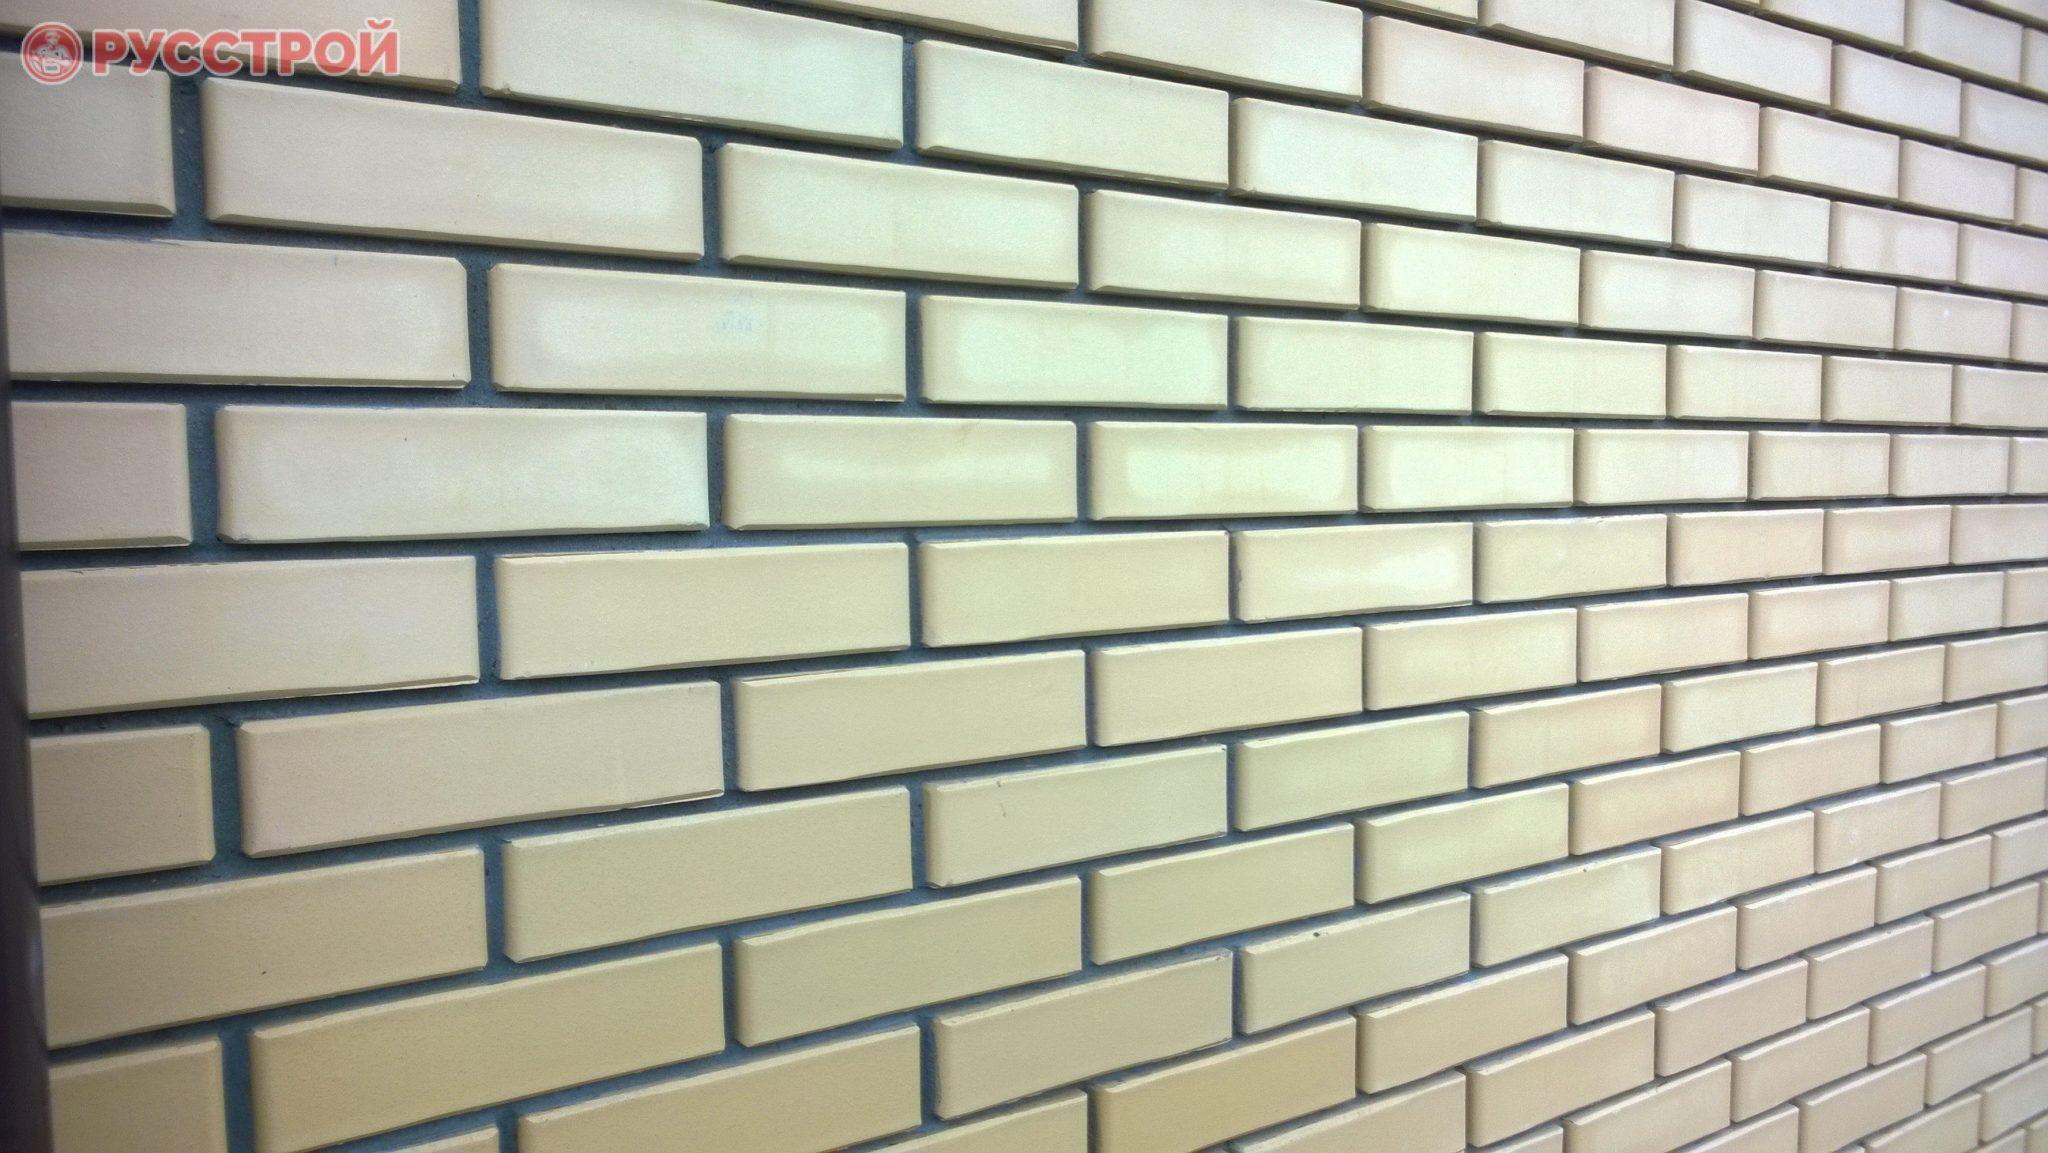 Кирпичная кладка стен. Русстрой г. Калуга